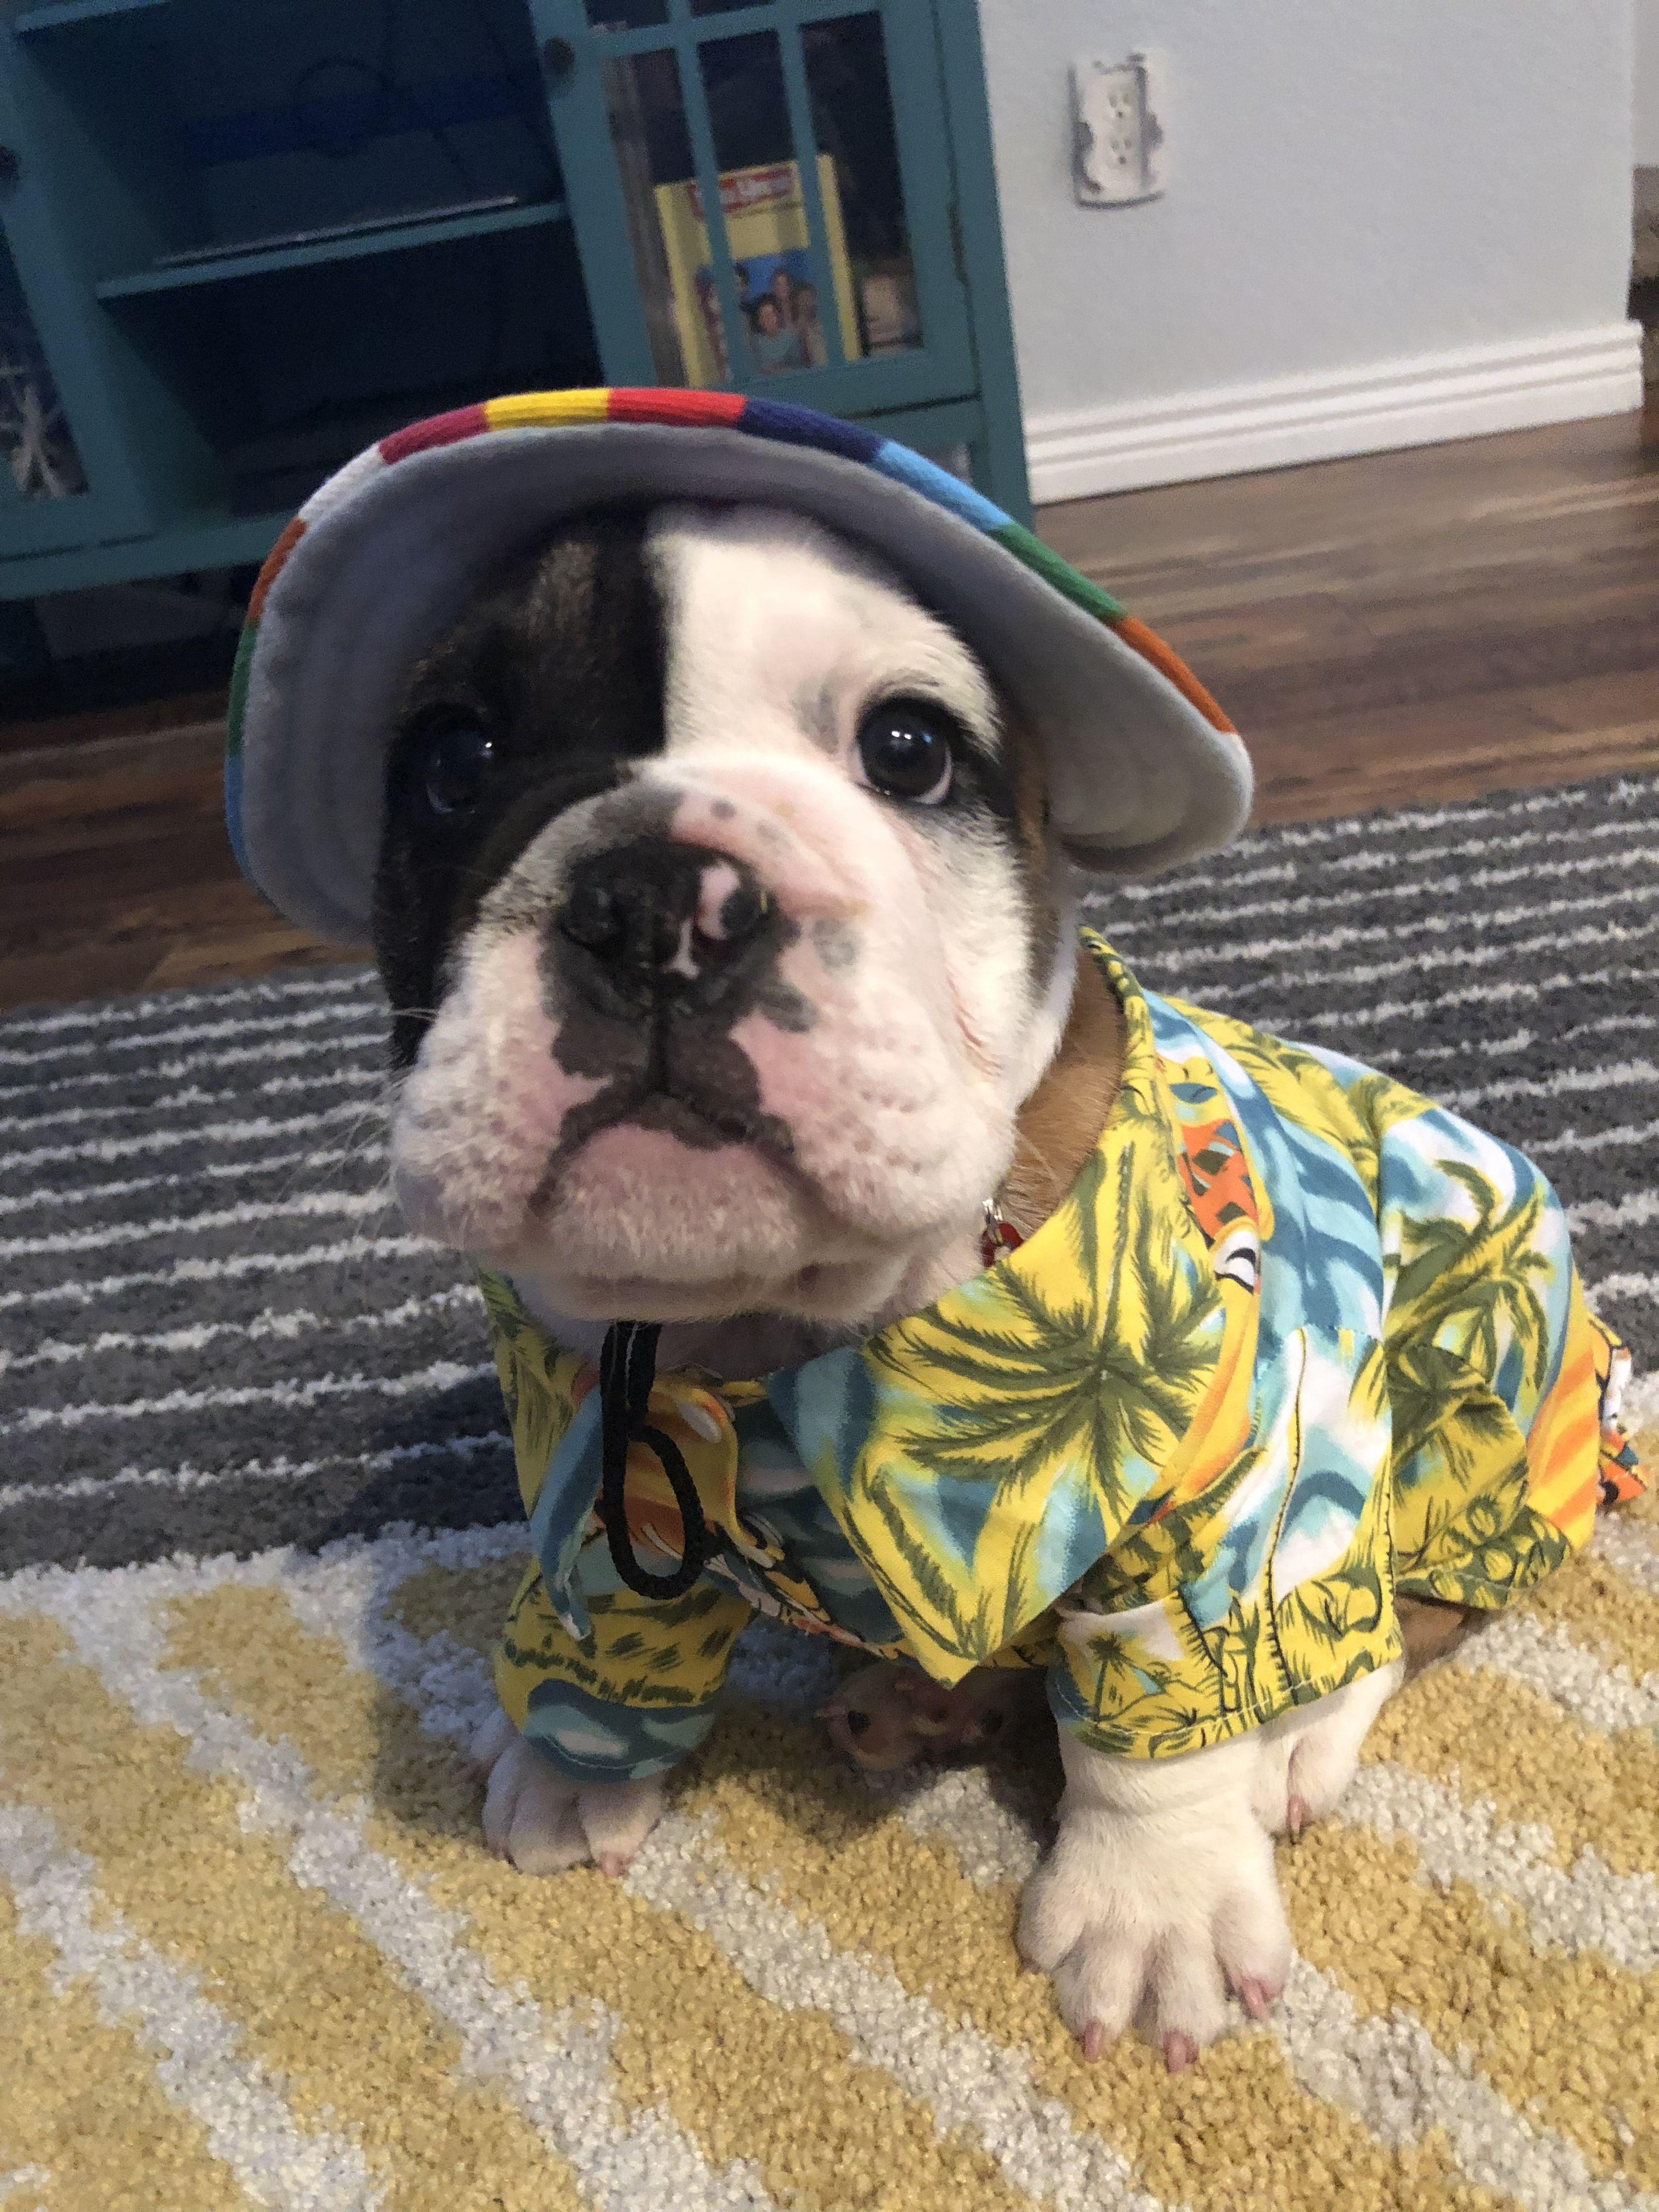 My Buddy Pudge The French Bulldog Puppy Bulldog